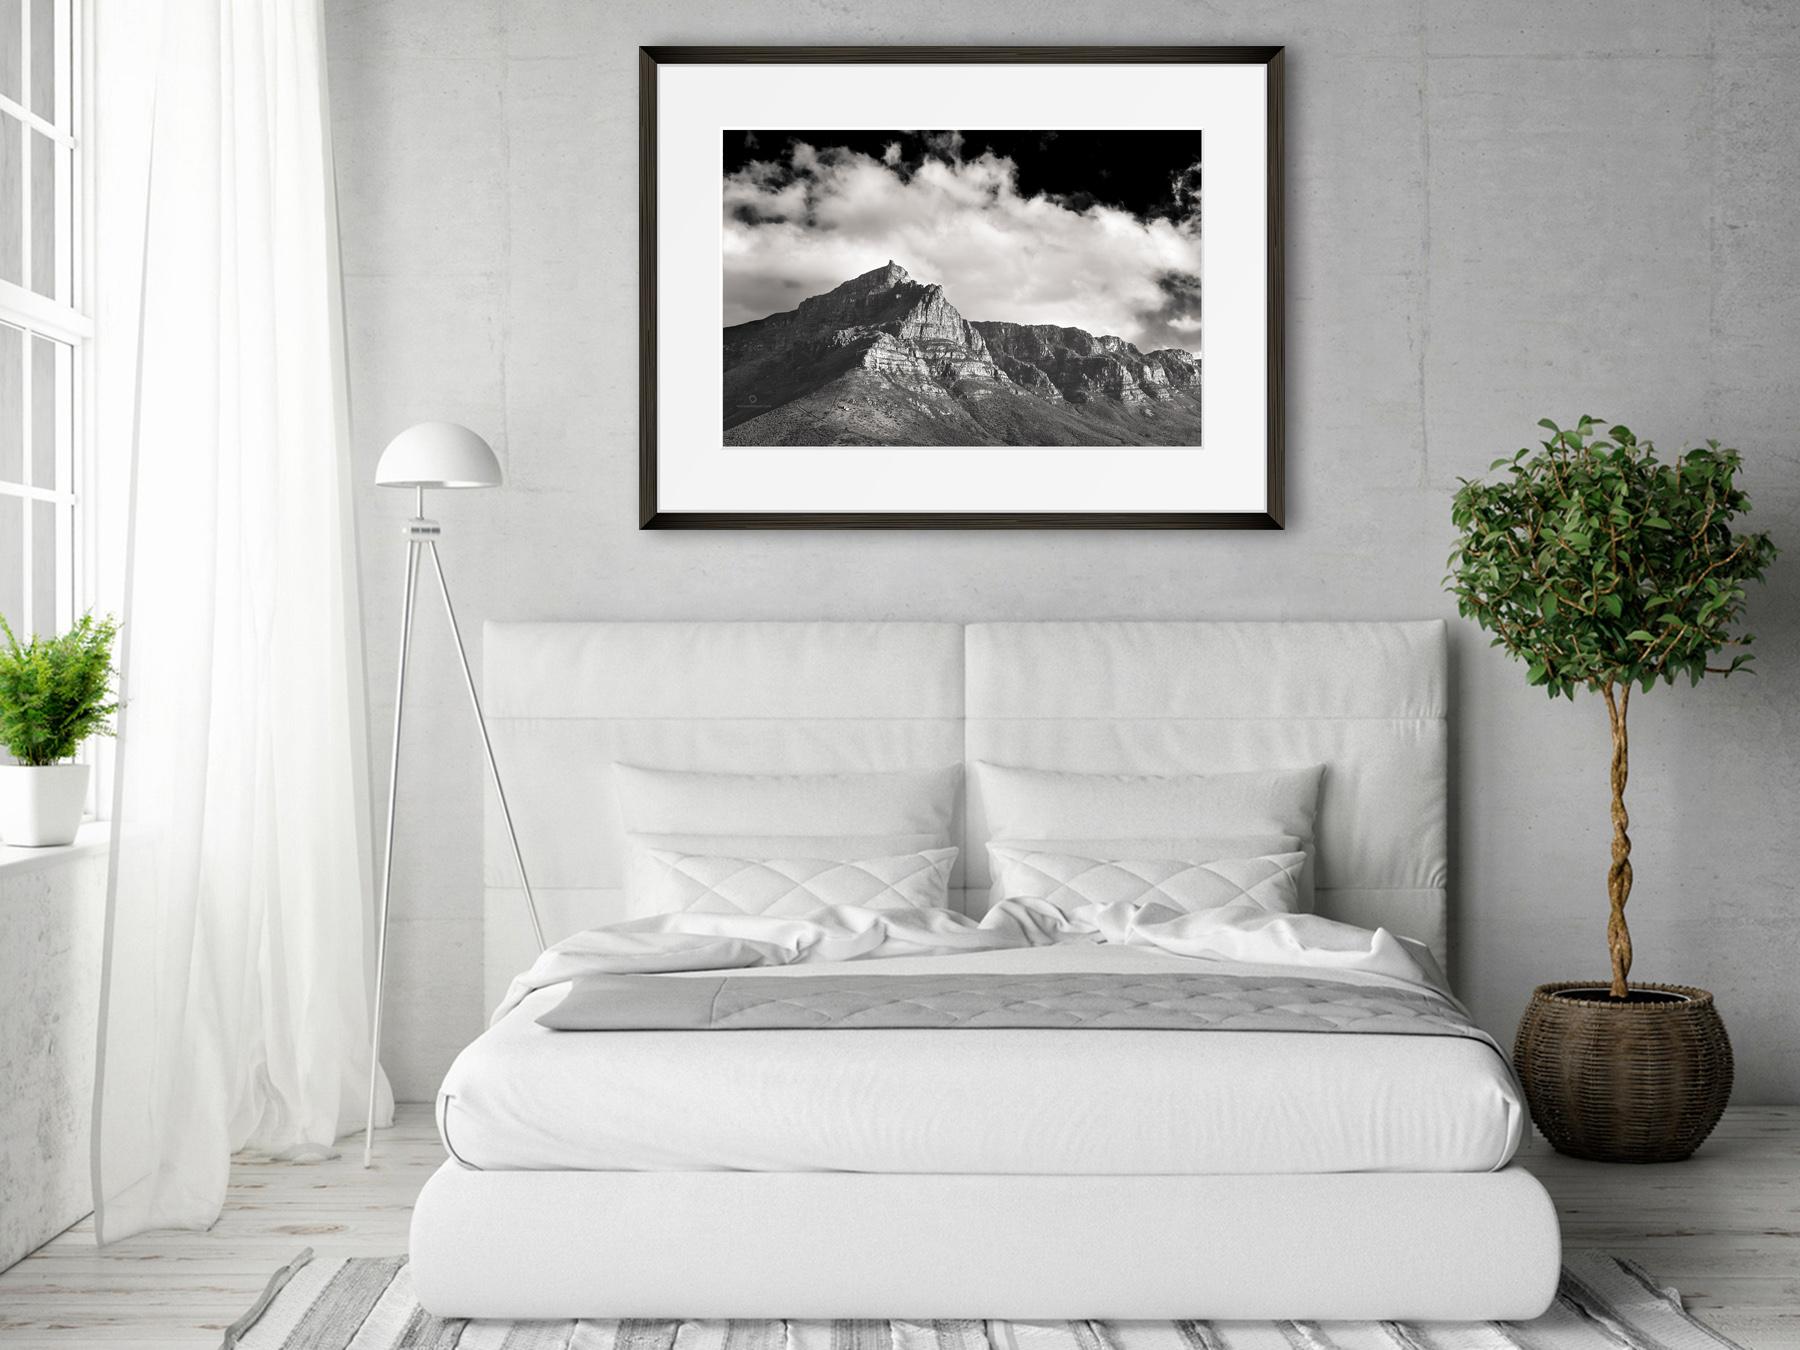 Landscape Photography - Buy Fine Art Prints: